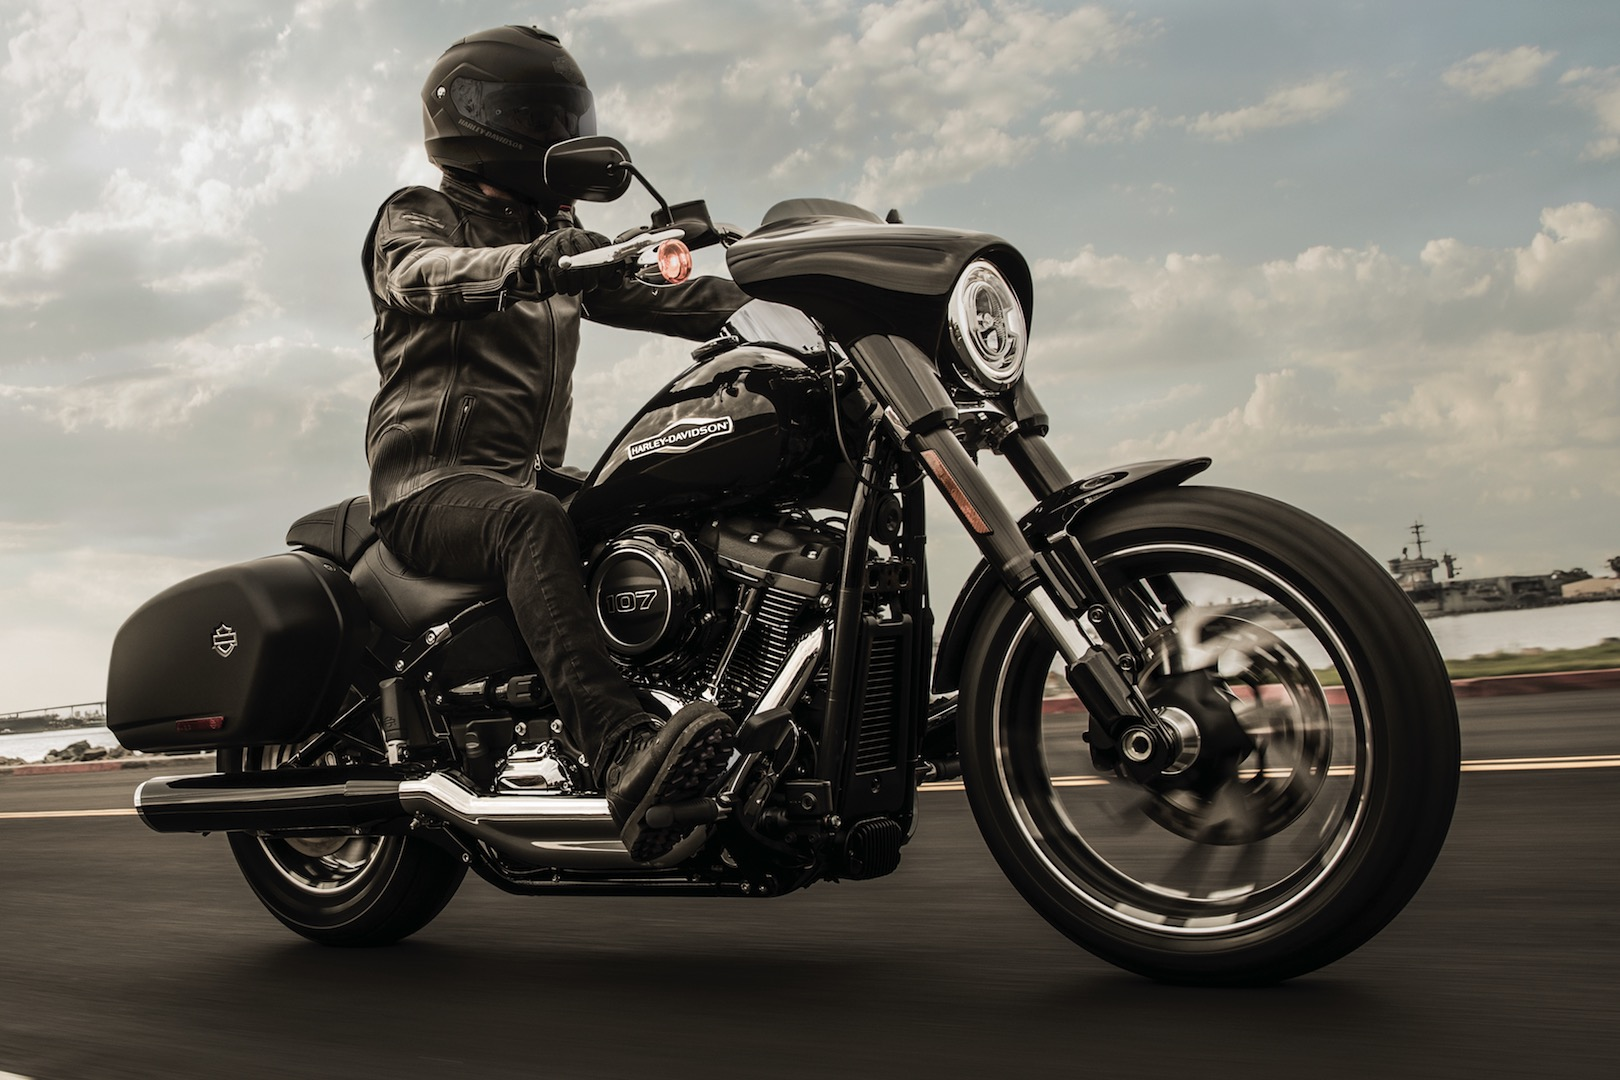 harley davidson softail 107 sport glide essai en moto magazine leader de l actualit. Black Bedroom Furniture Sets. Home Design Ideas